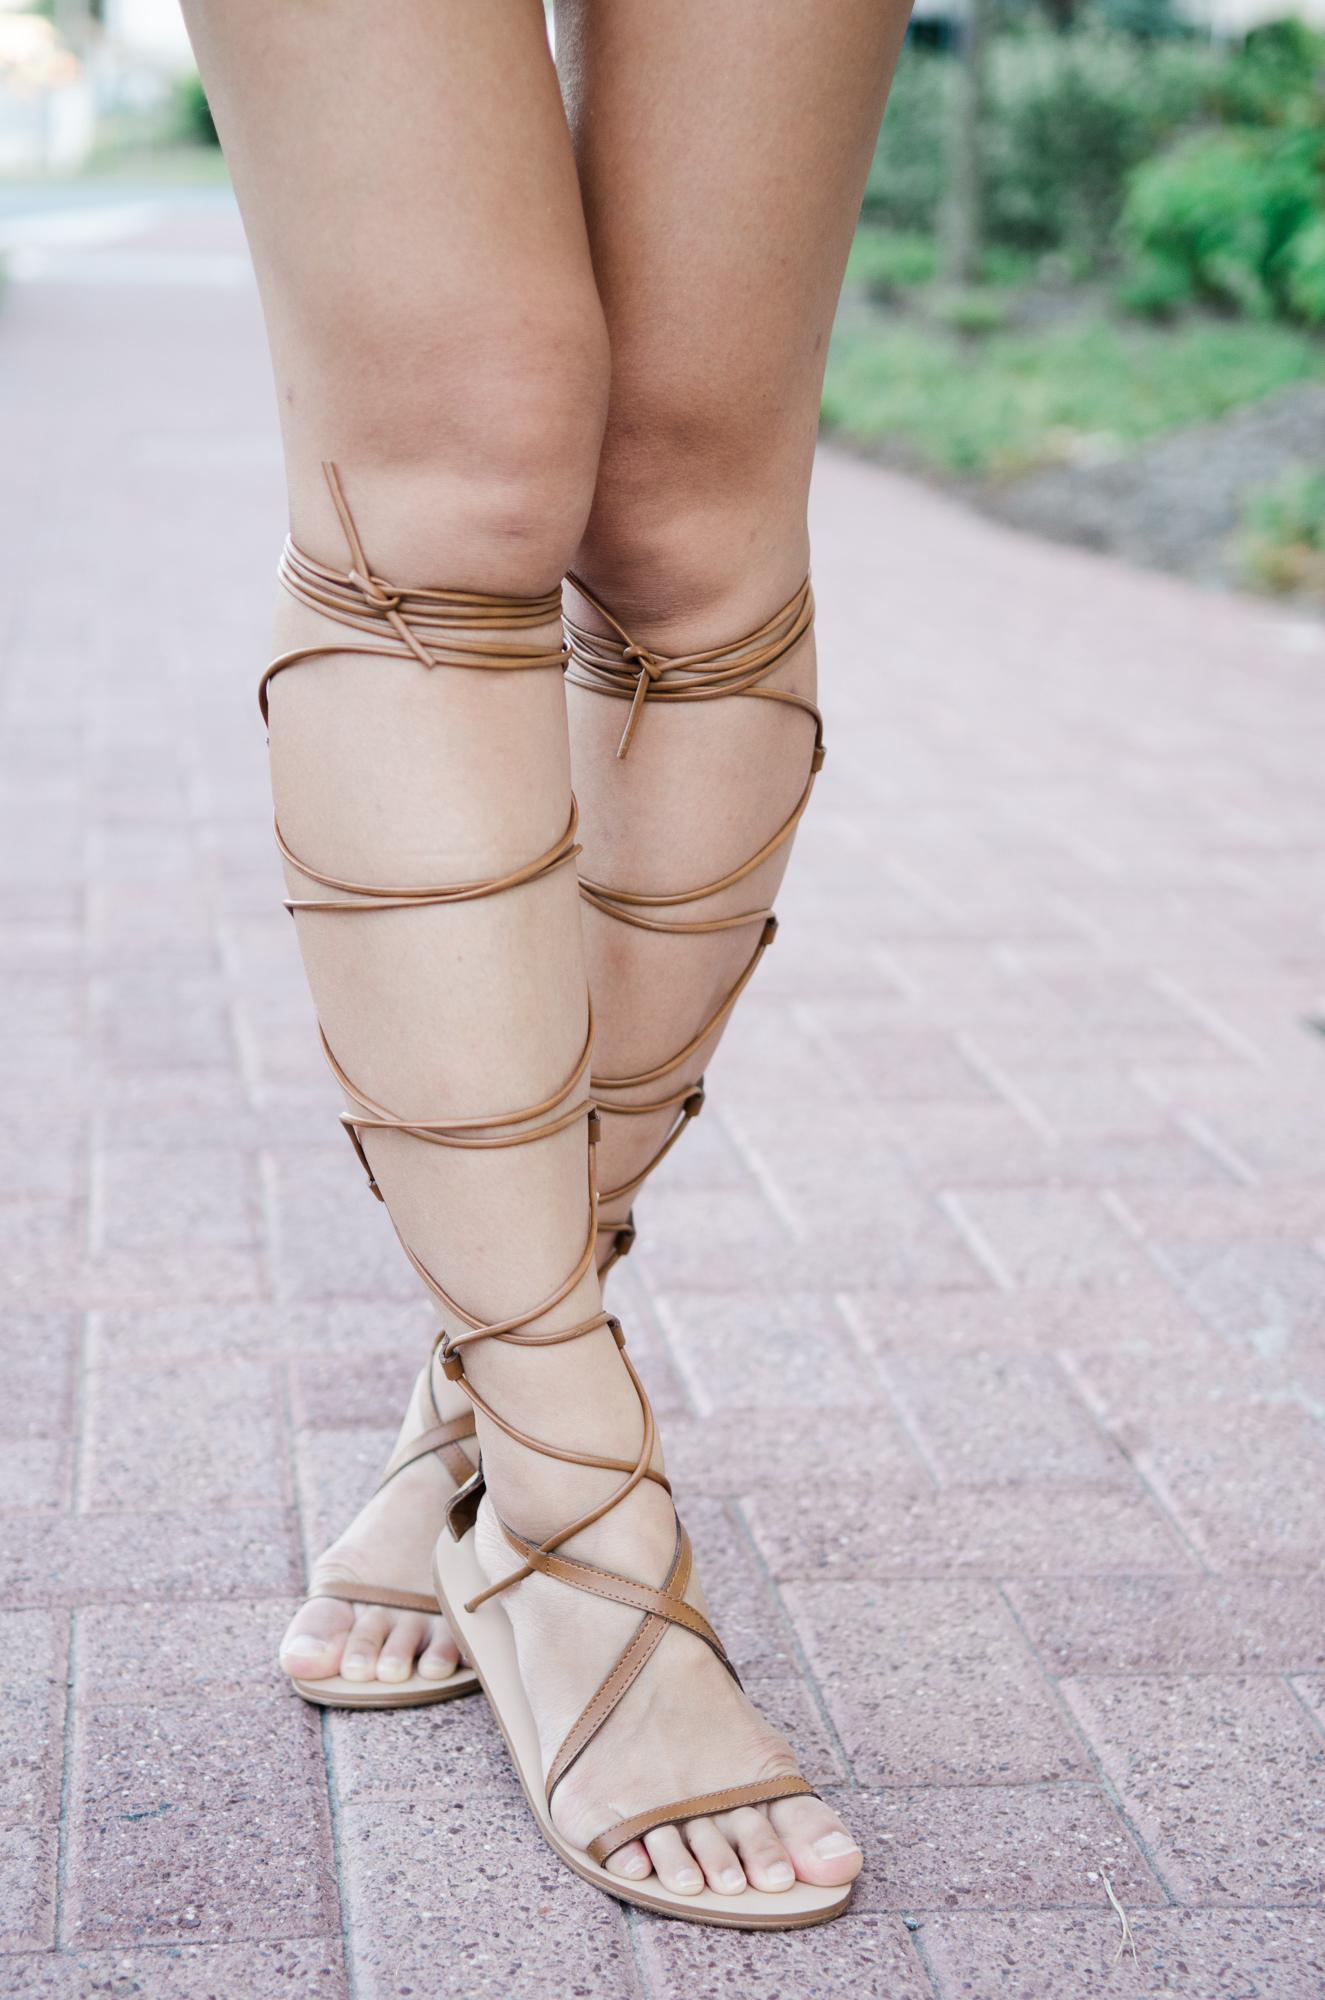 forever 21 gladiator sandals